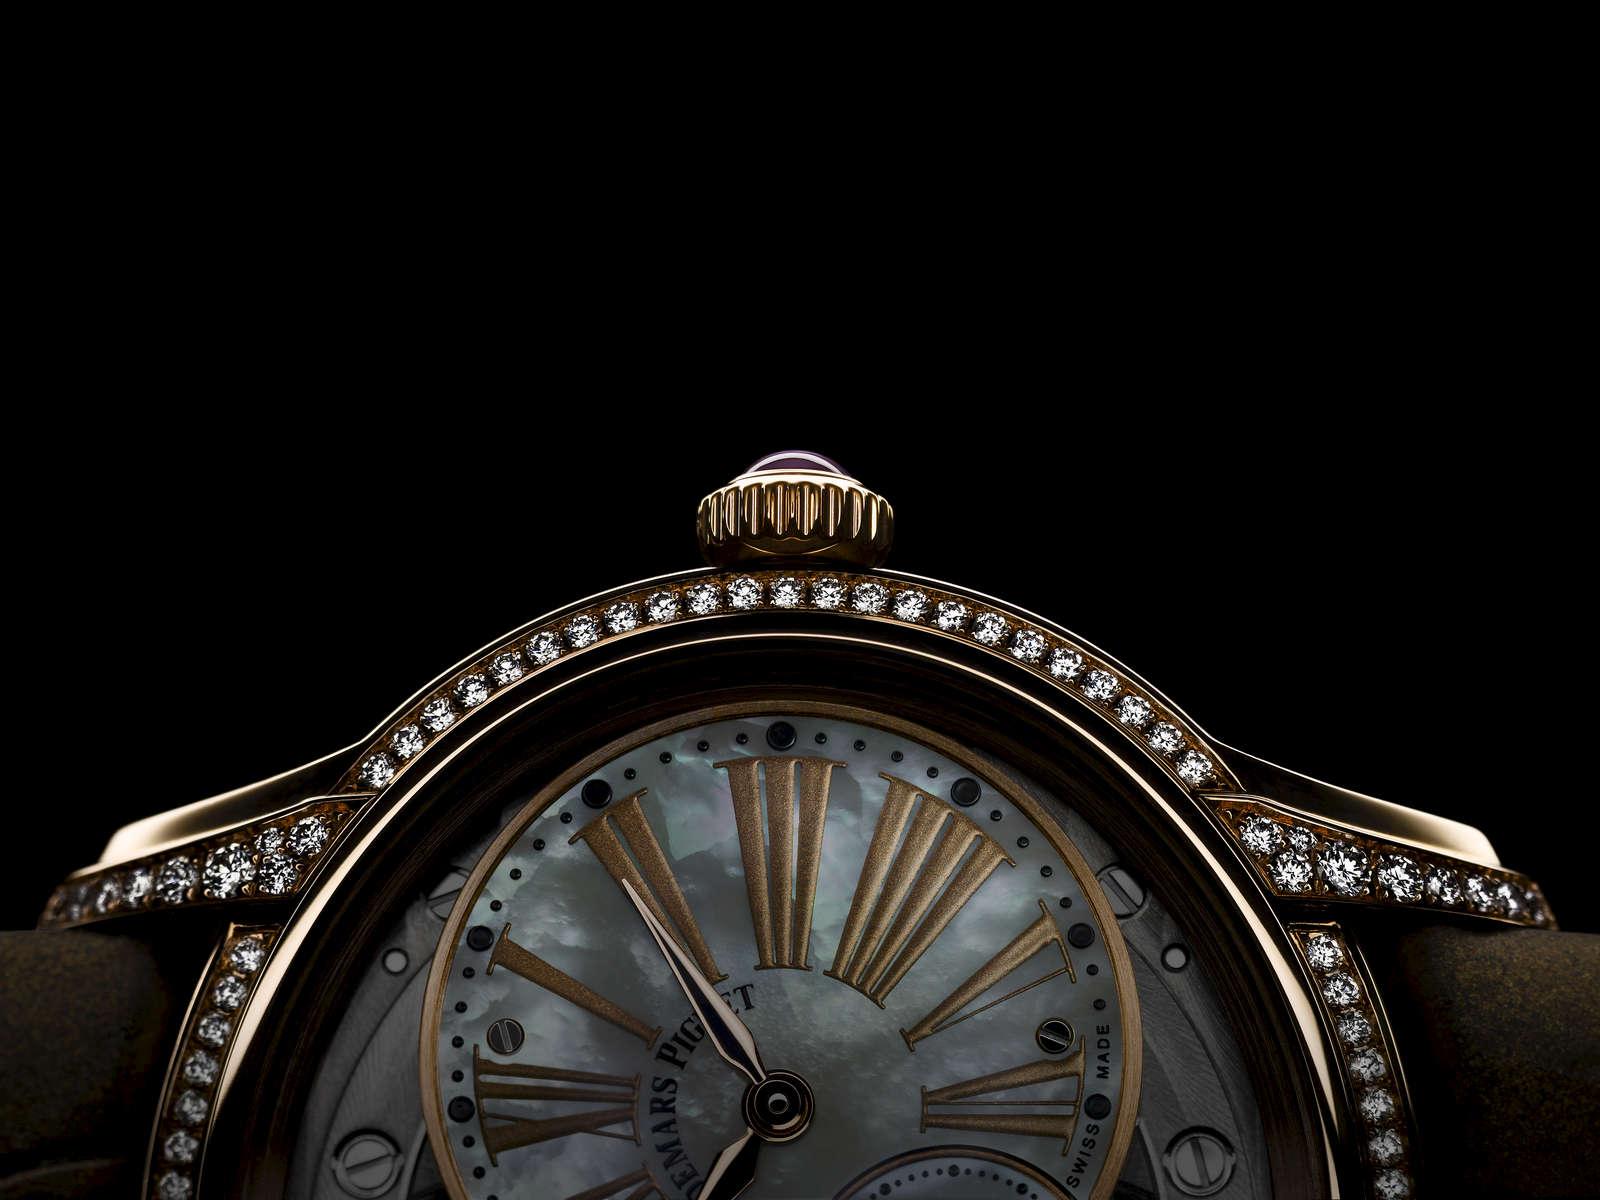 grid_horlogerie_16